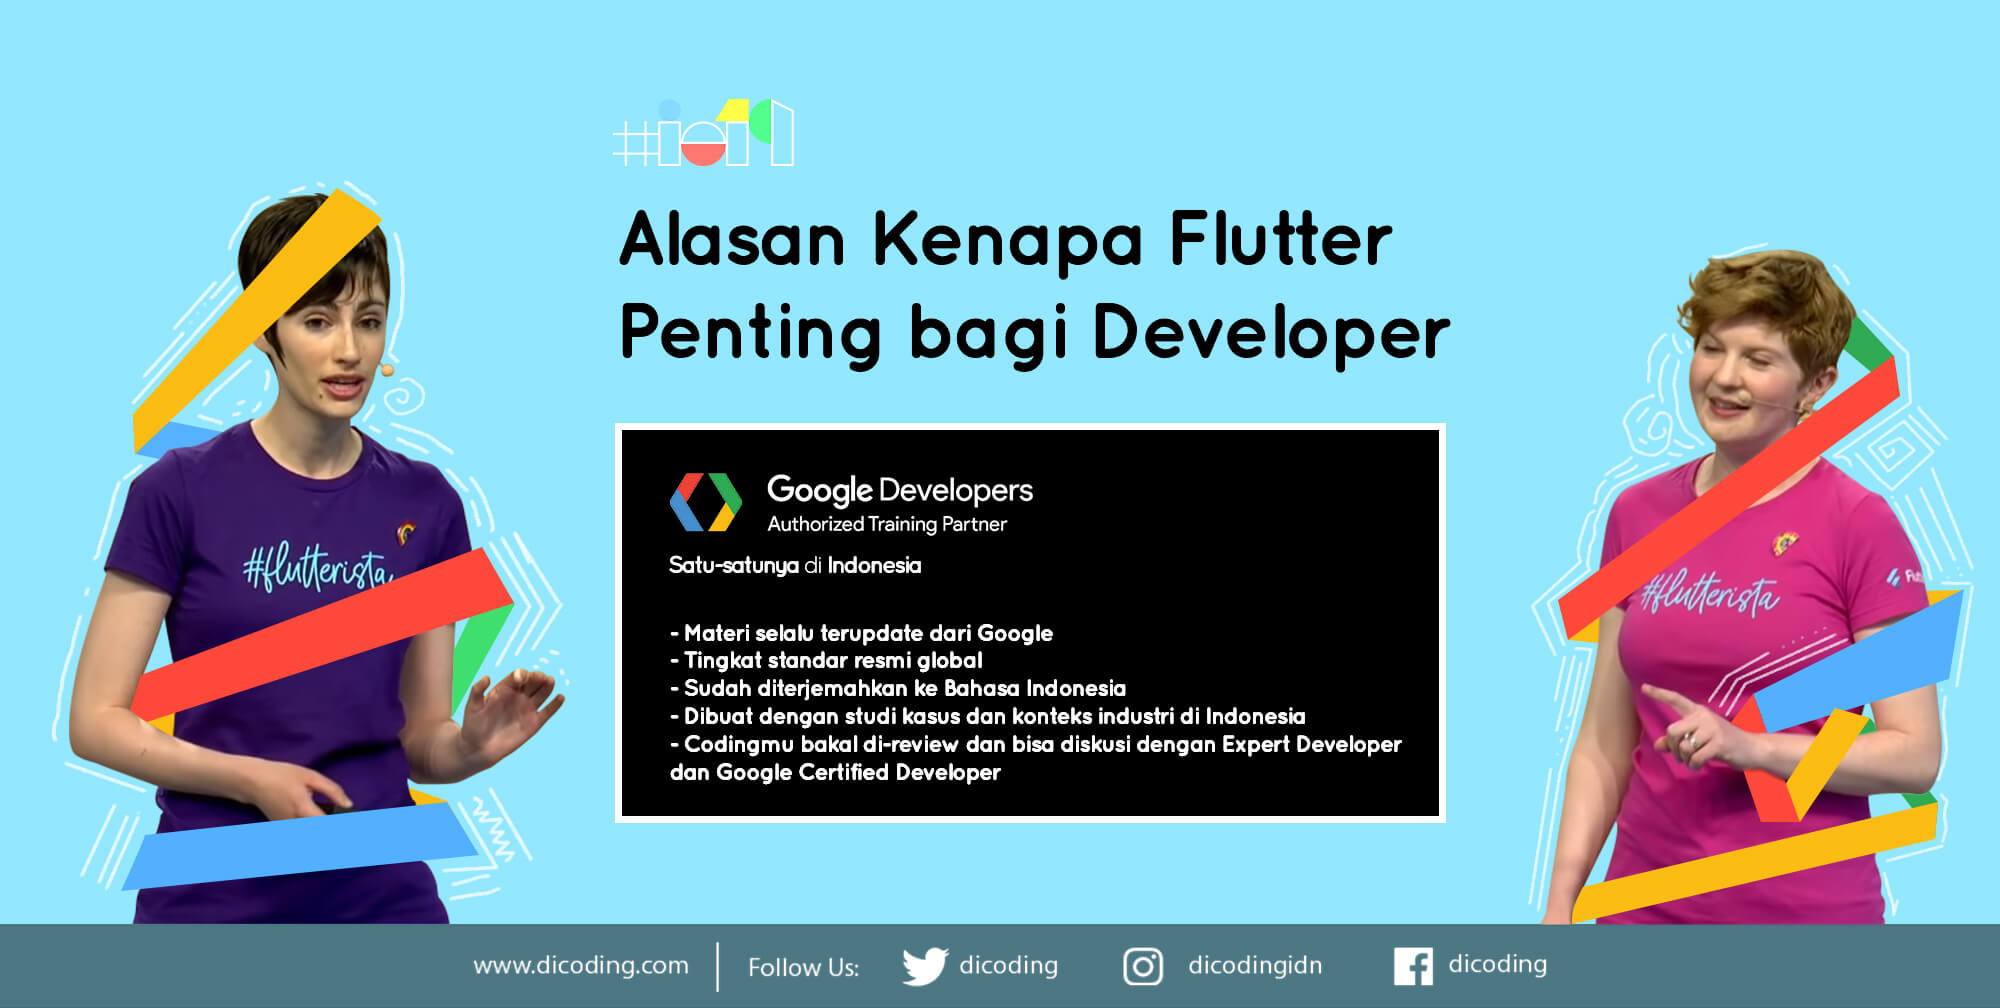 Alasan kenapa flutter penting bagi developer